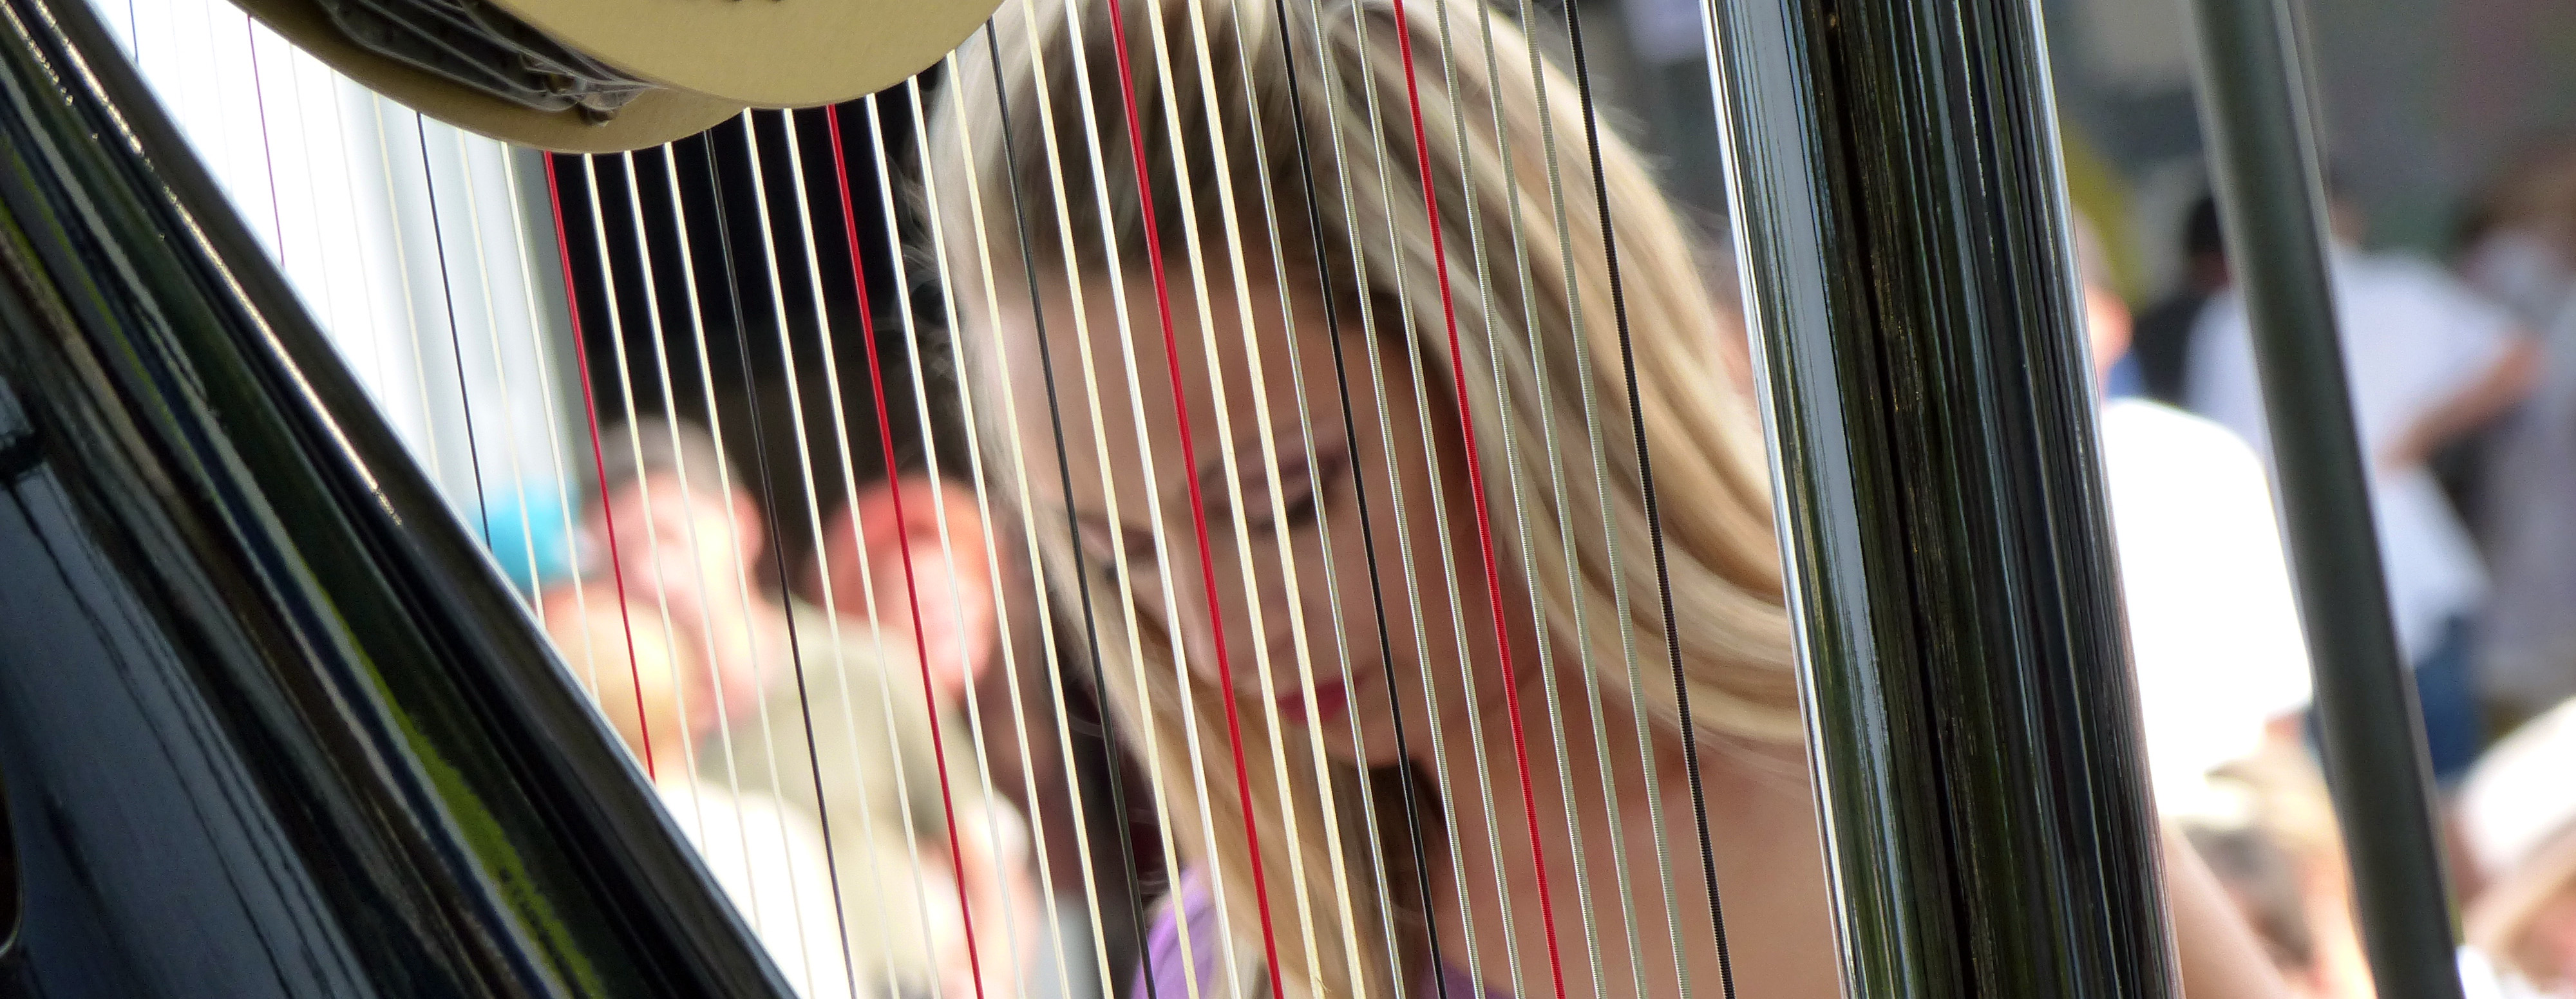 harpist jazz france europe